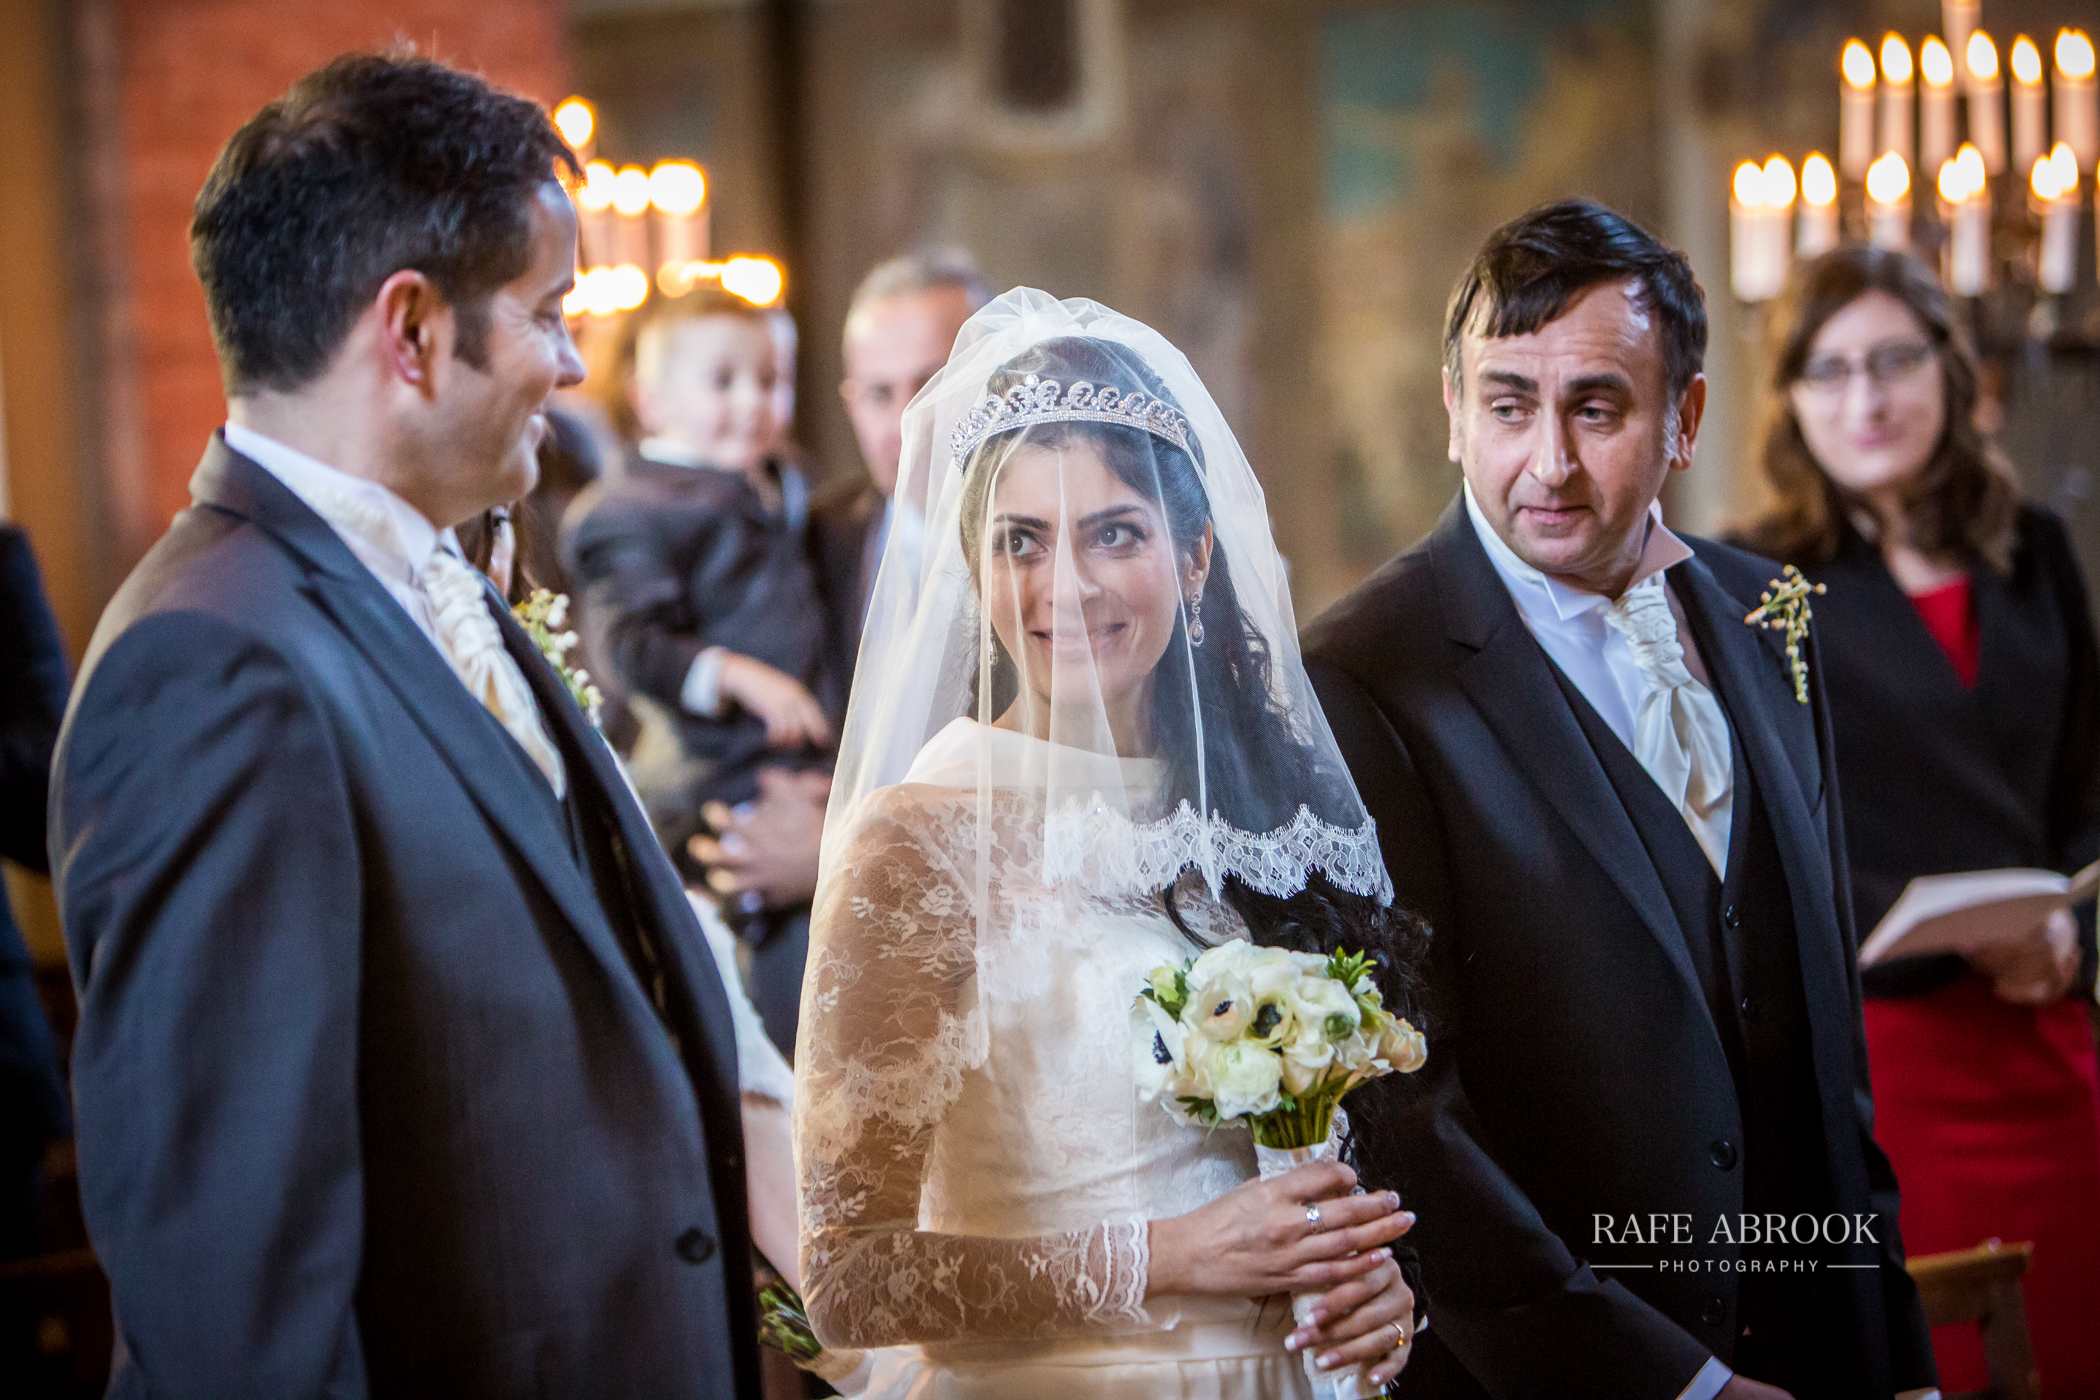 roma & pete wedding hampstead shenley hertfordshire -147.jpg